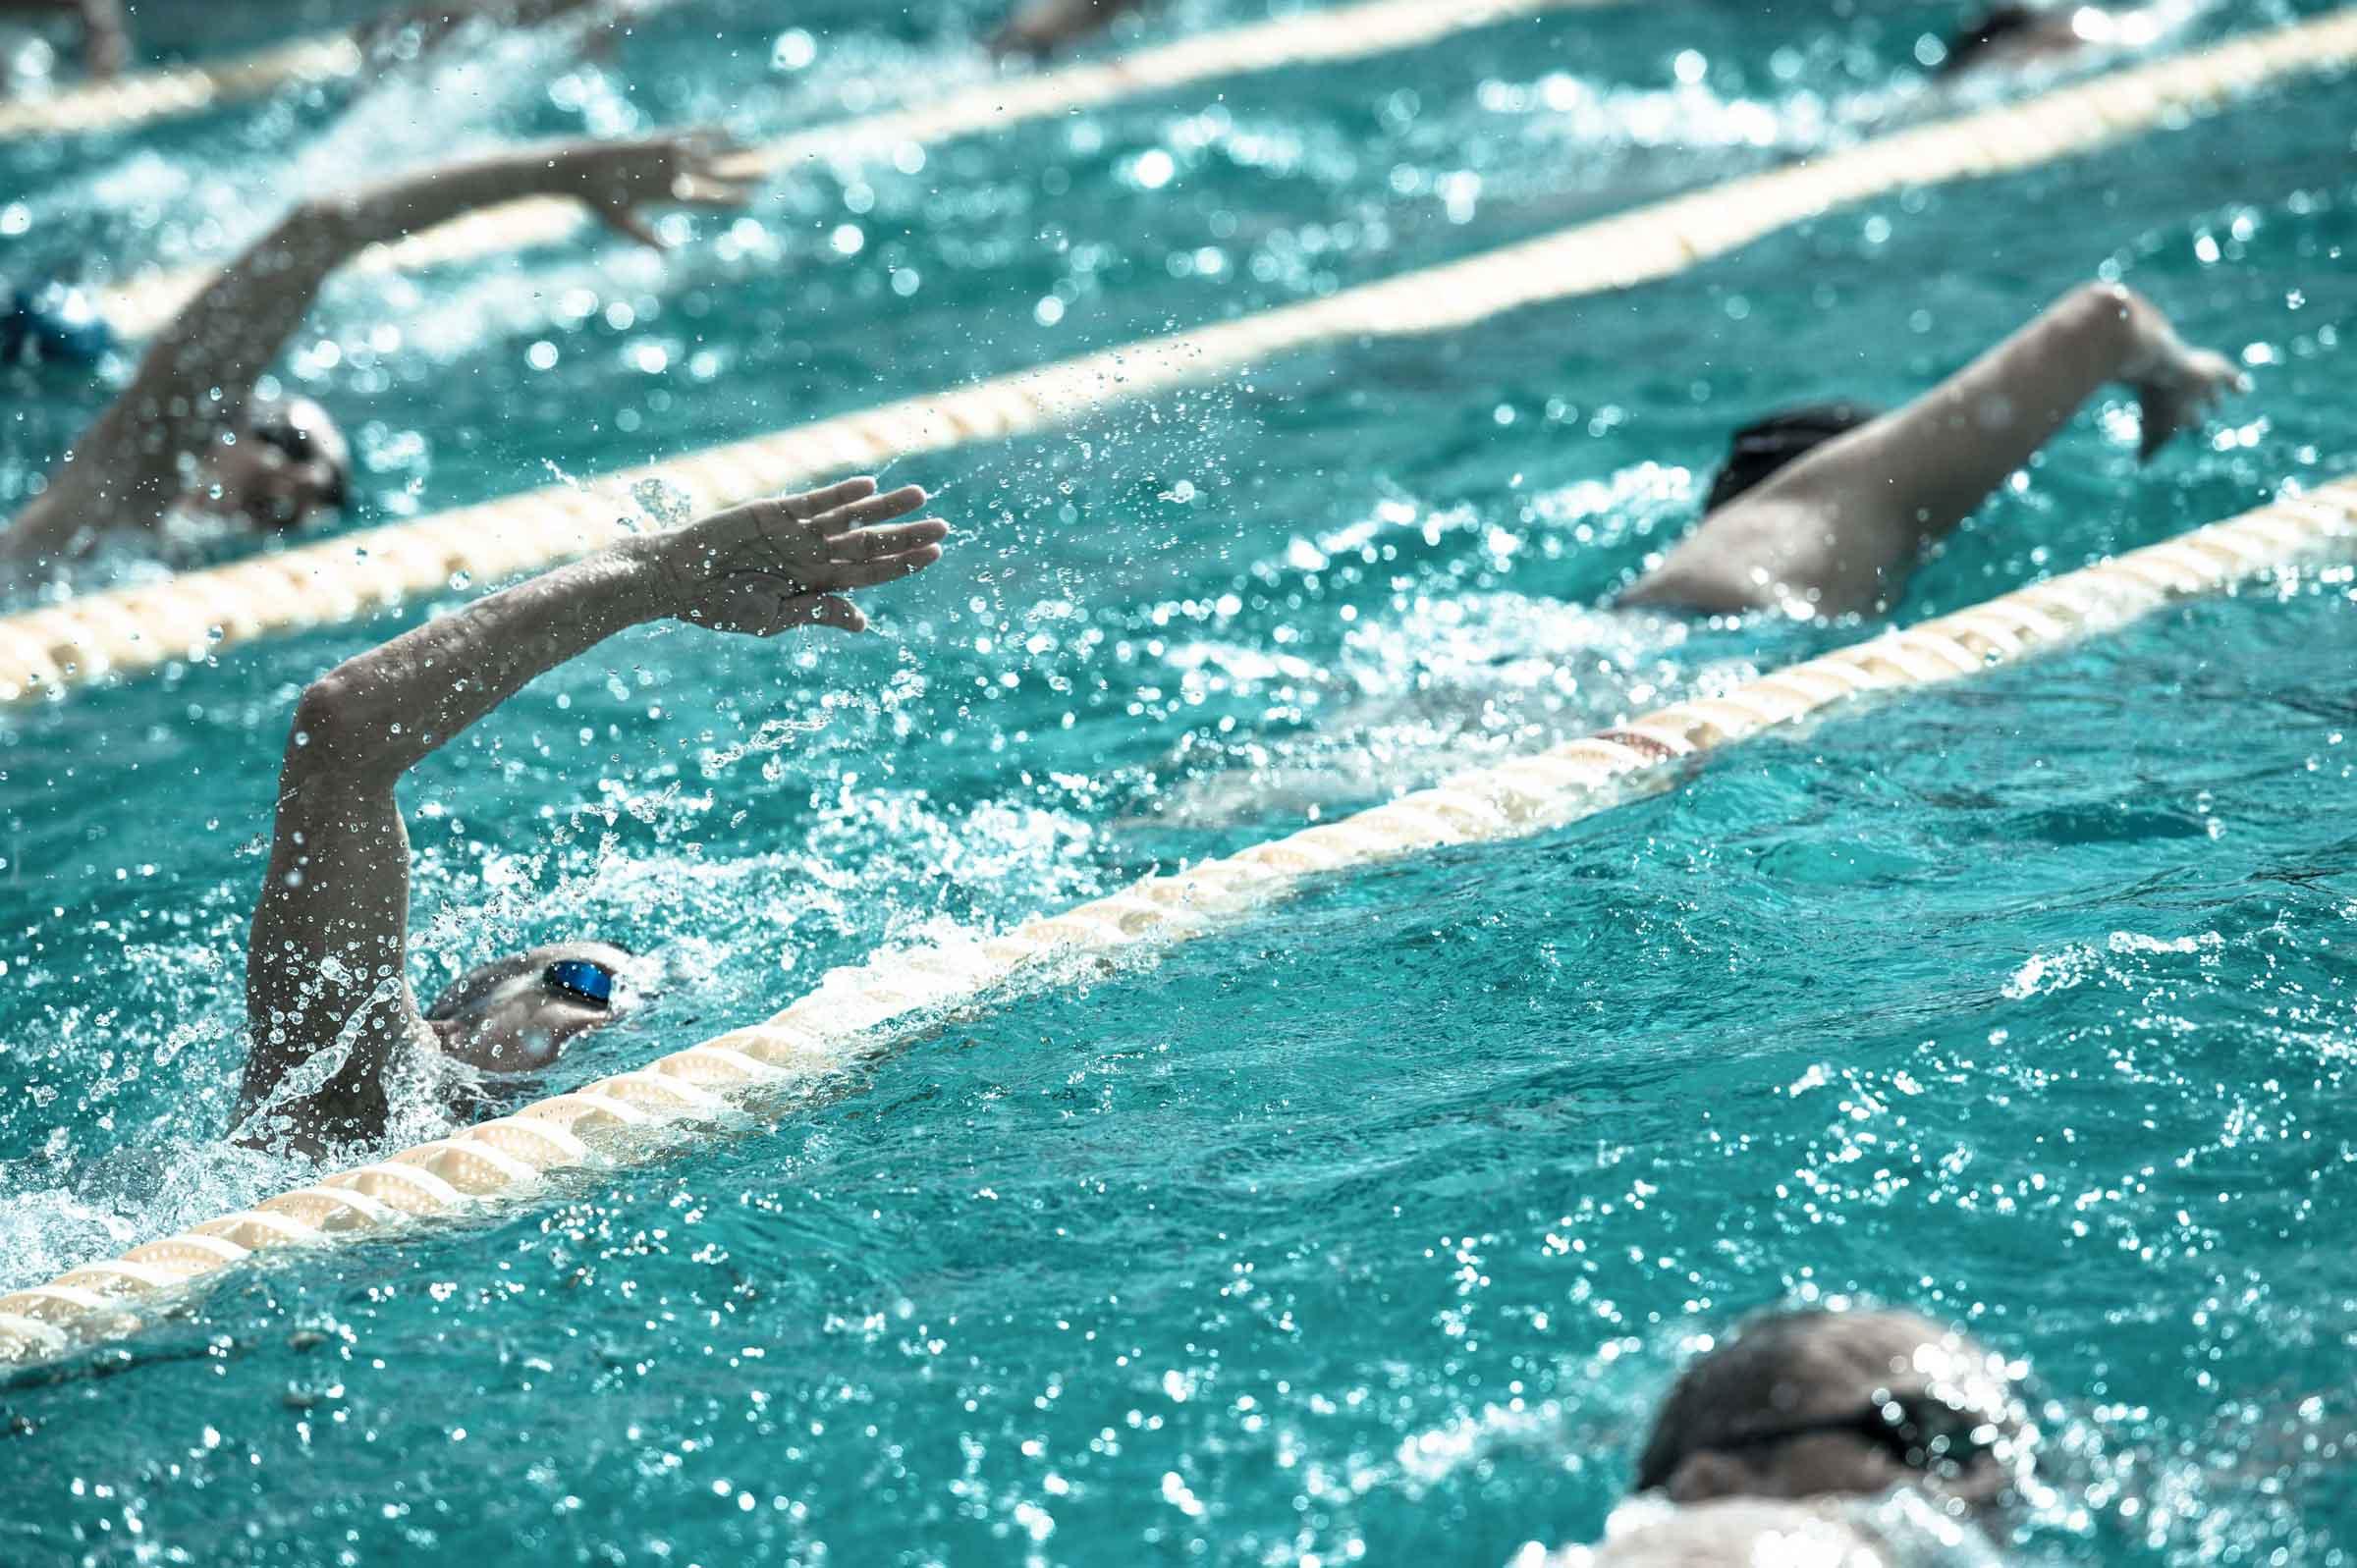 Bridge-Athletic-Swim-by-Mike-Lewis-39_Optimized